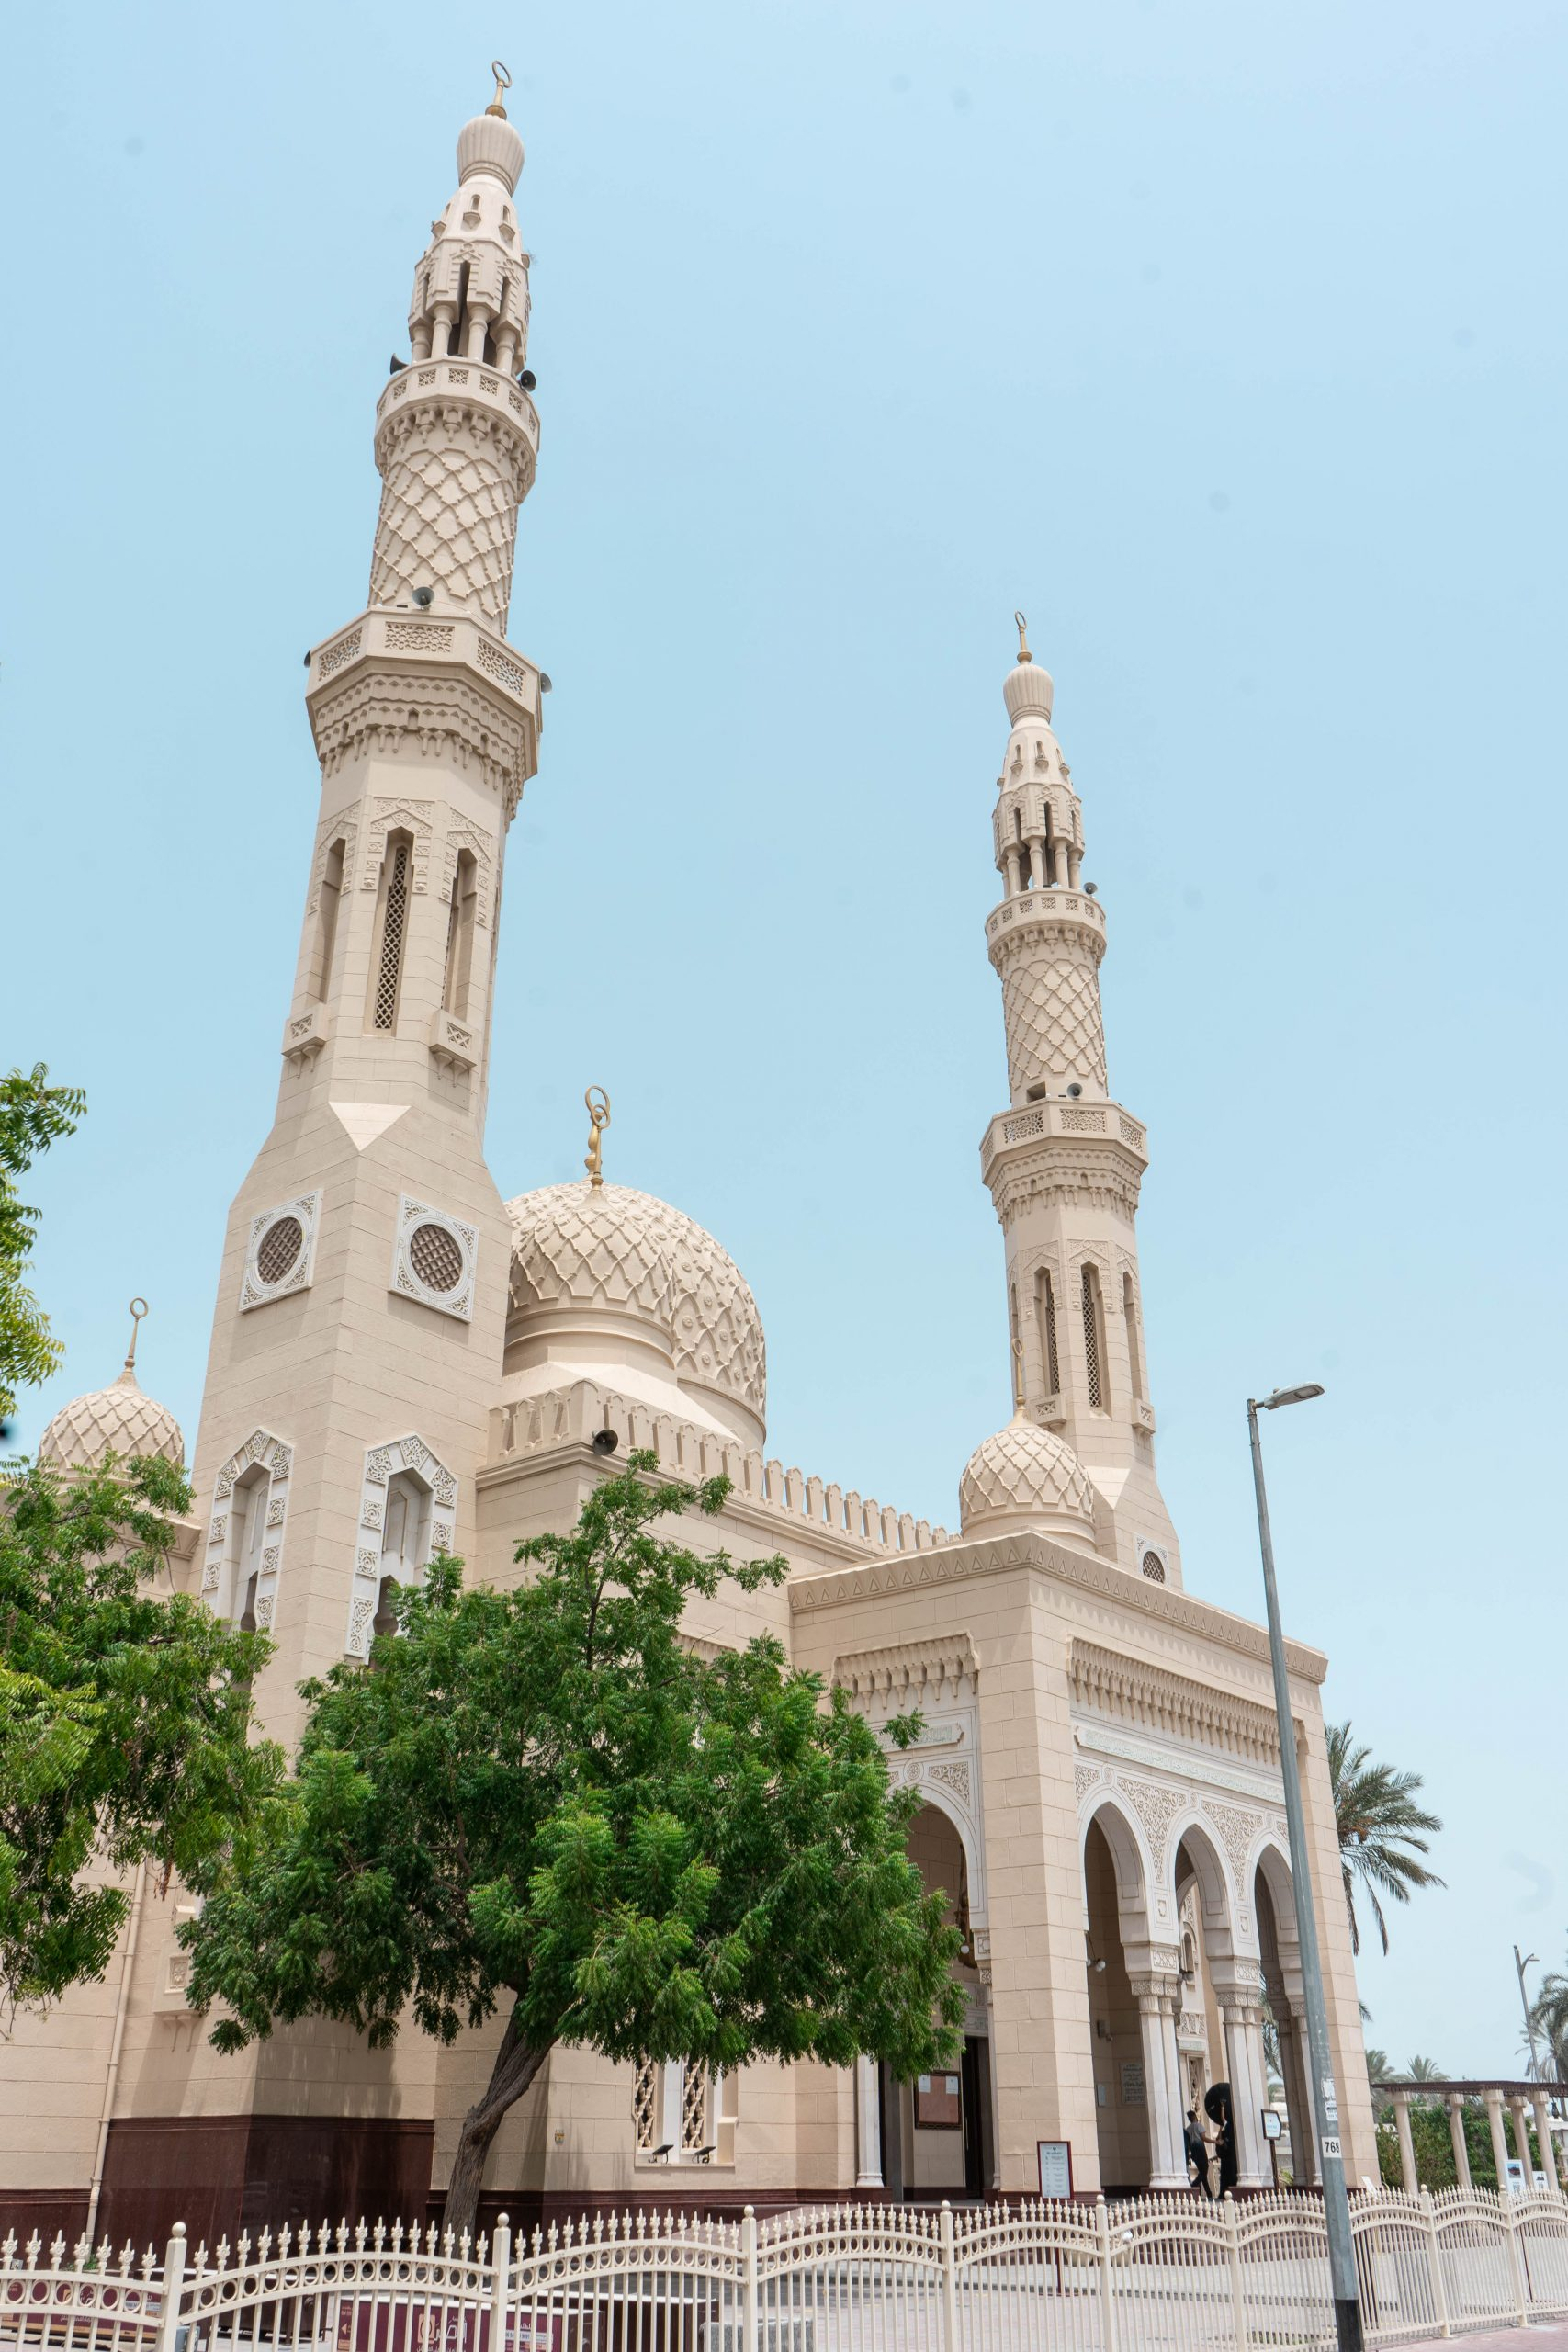 jumeirah mosque fatimid architecture dubai uae united arab emirates masjid